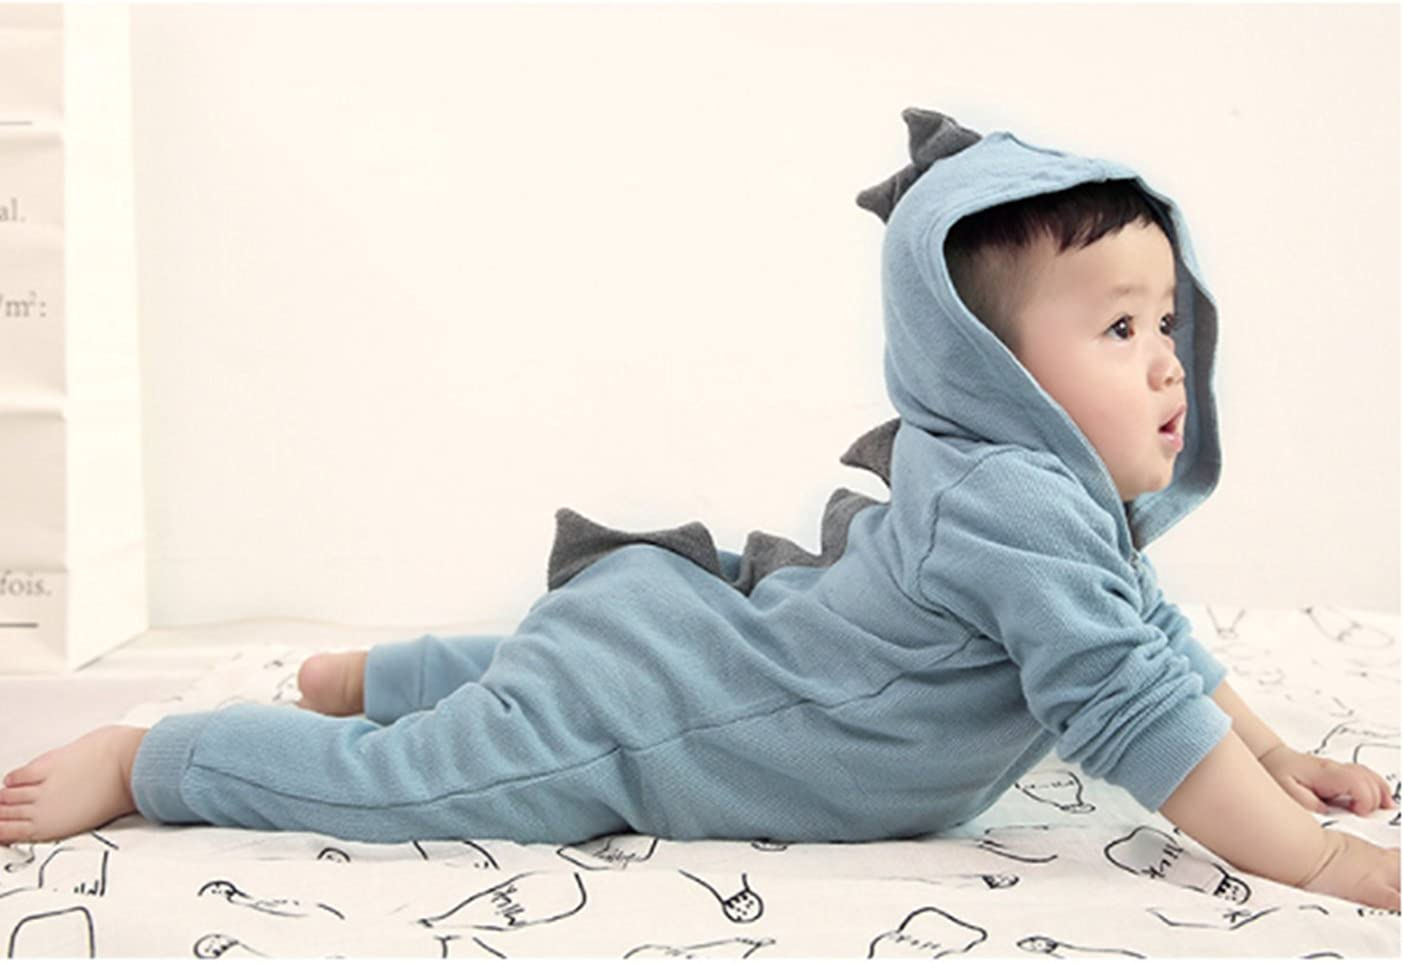 MetCuento Newborn Baby Boys Girls Dinosaur Hoodie Romper Onesies Jumpsuit Bodysuit Outfits Clothes 3-24 Months